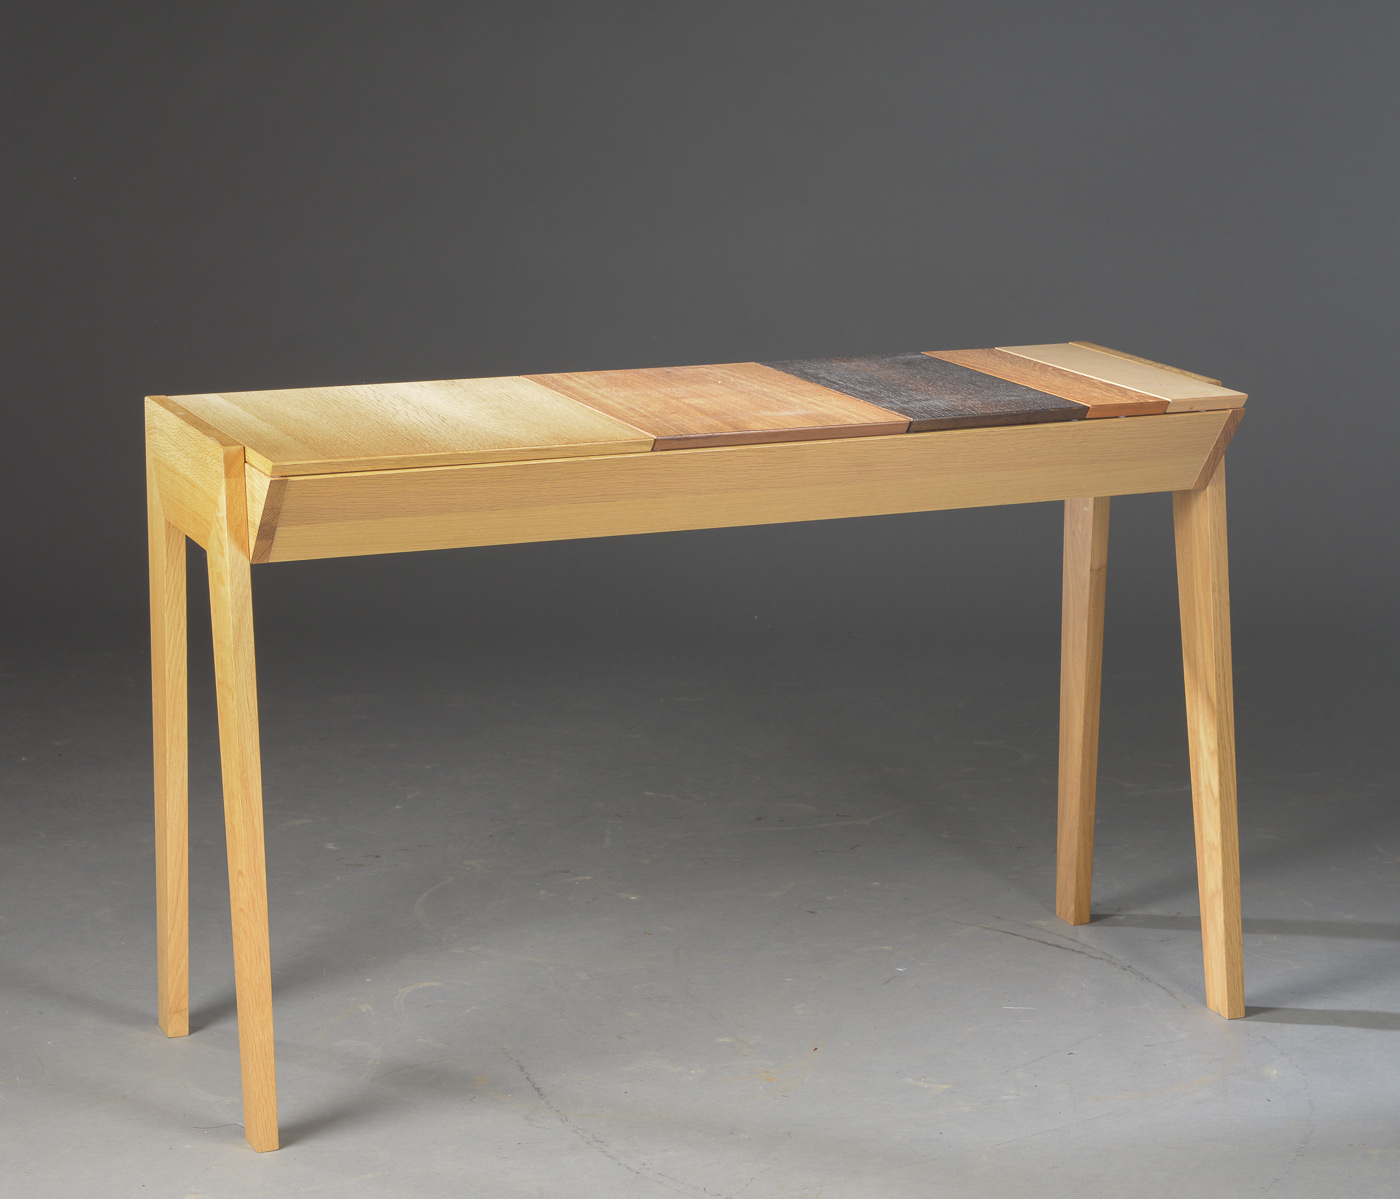 Bolia skrivebord | FINN.no